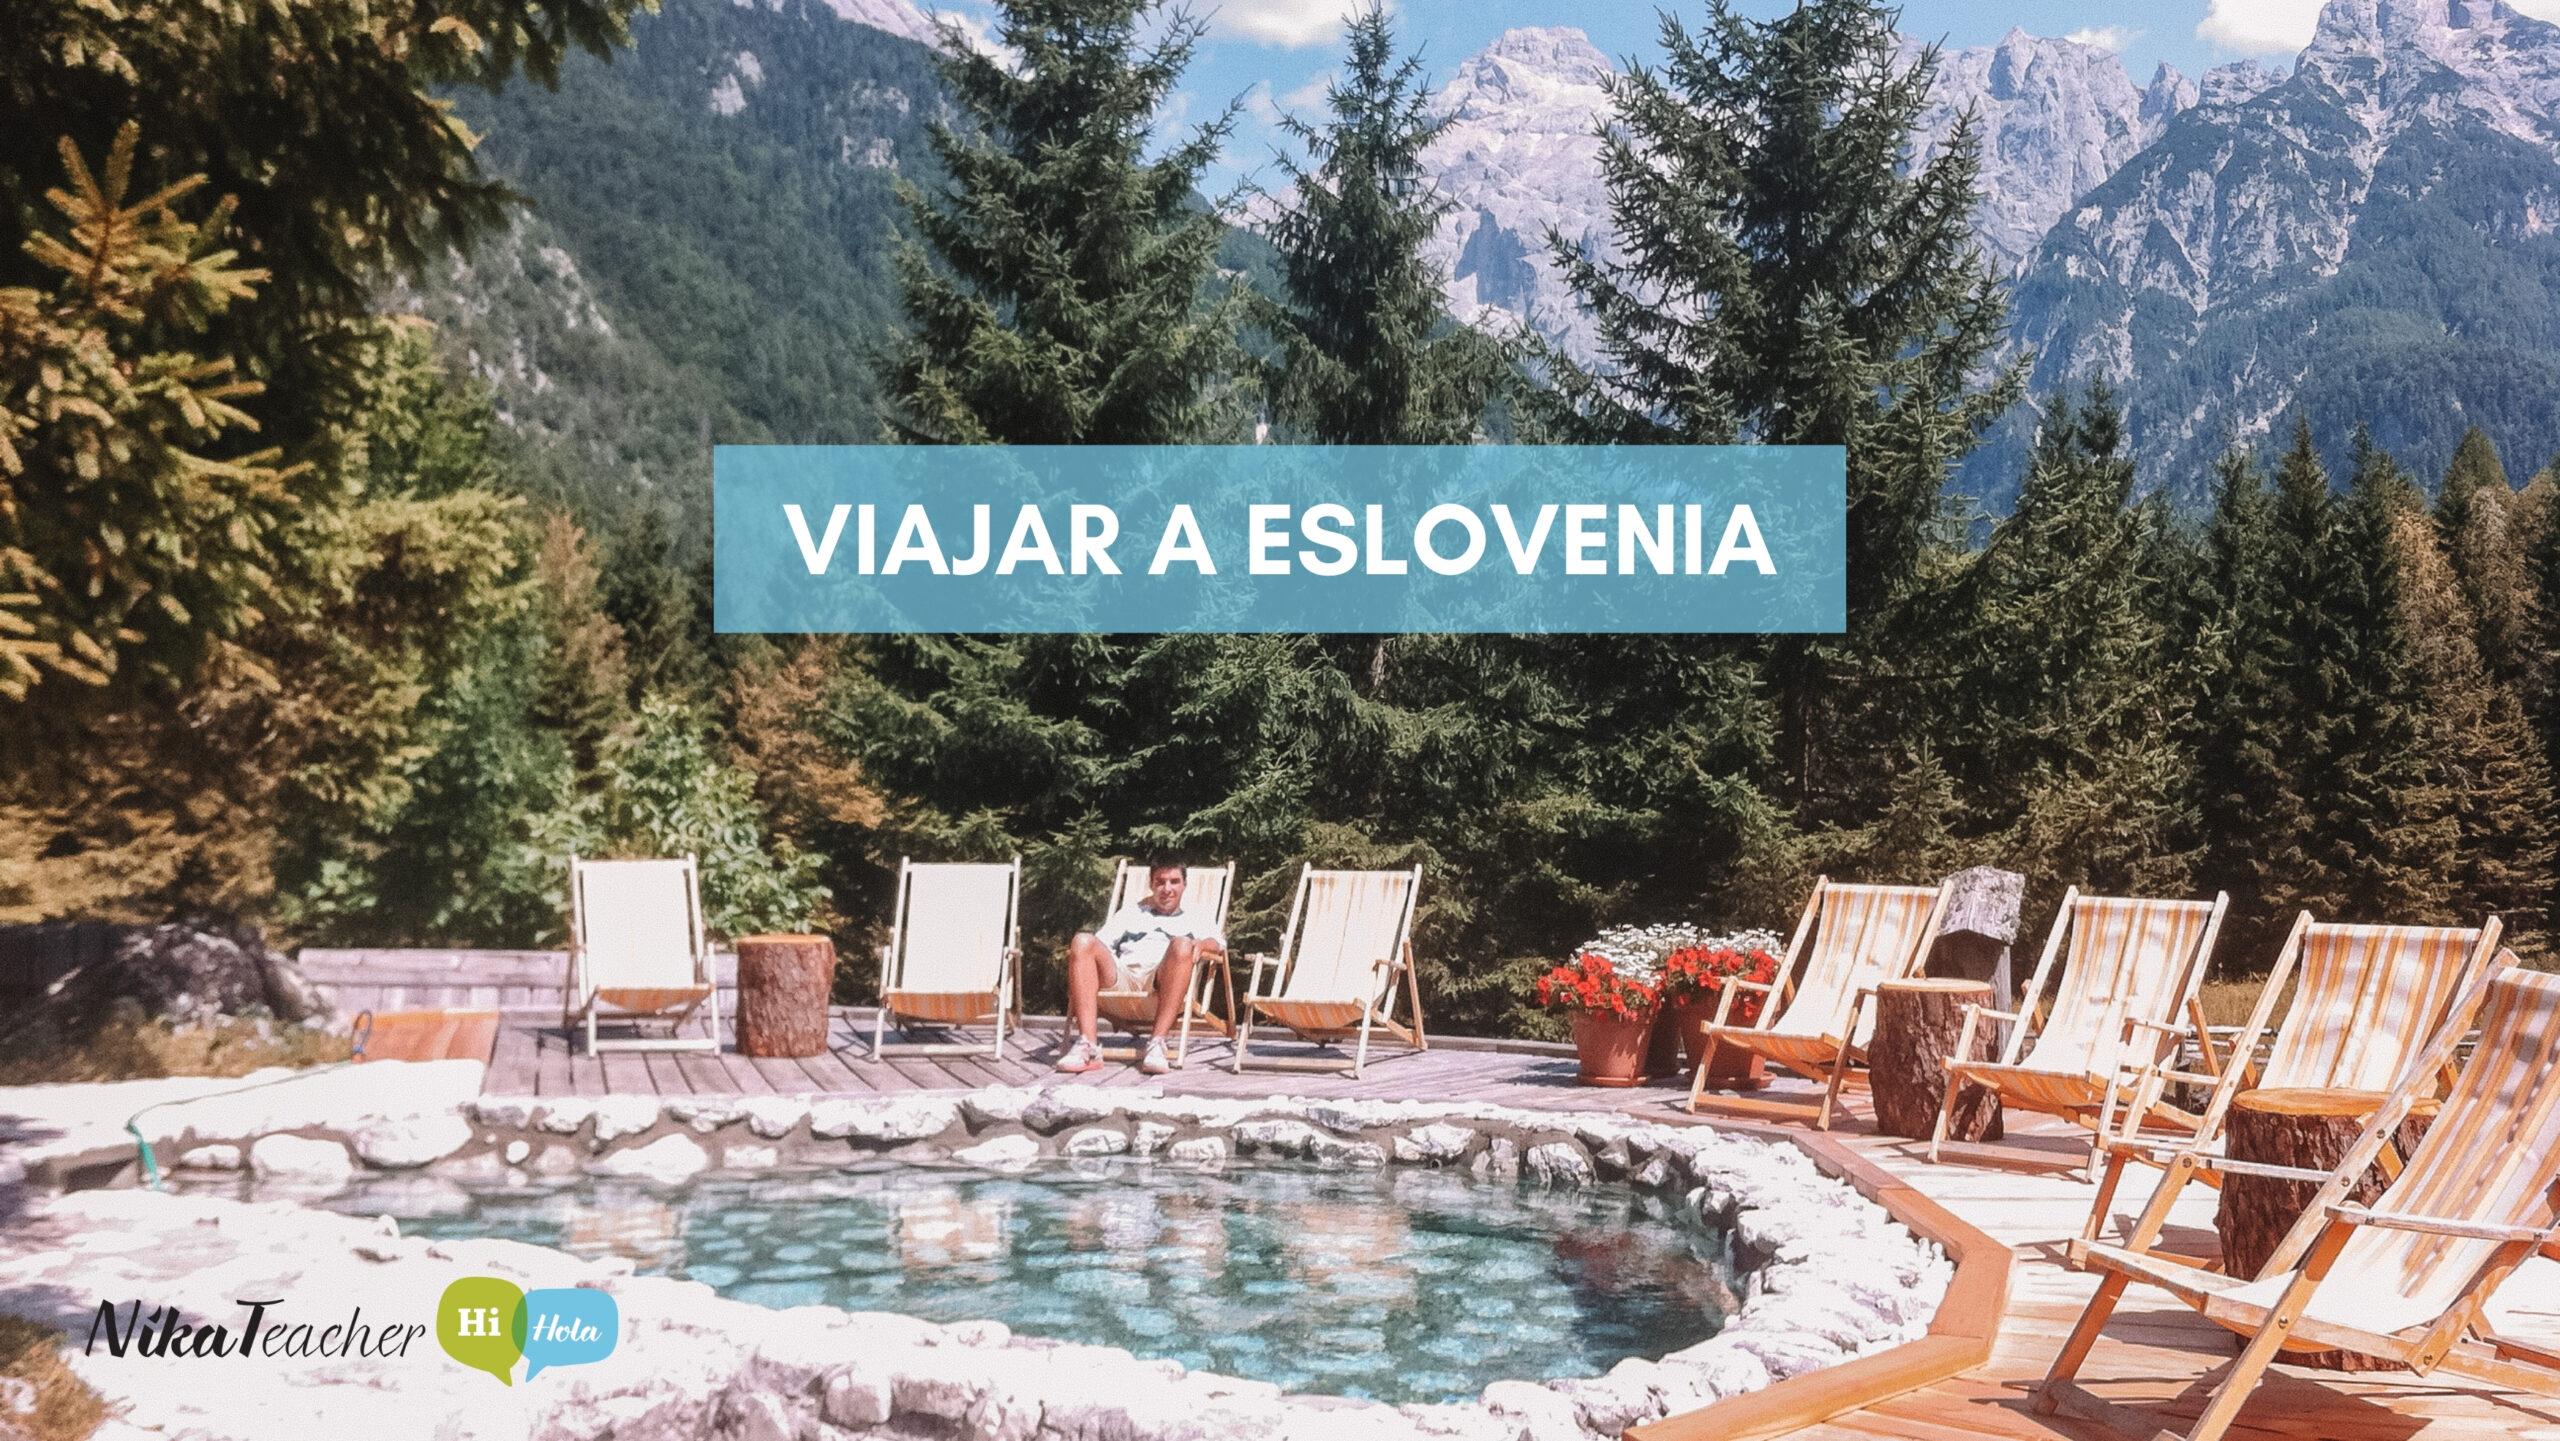 Viajar a Eslovenia, travel in Slovenia